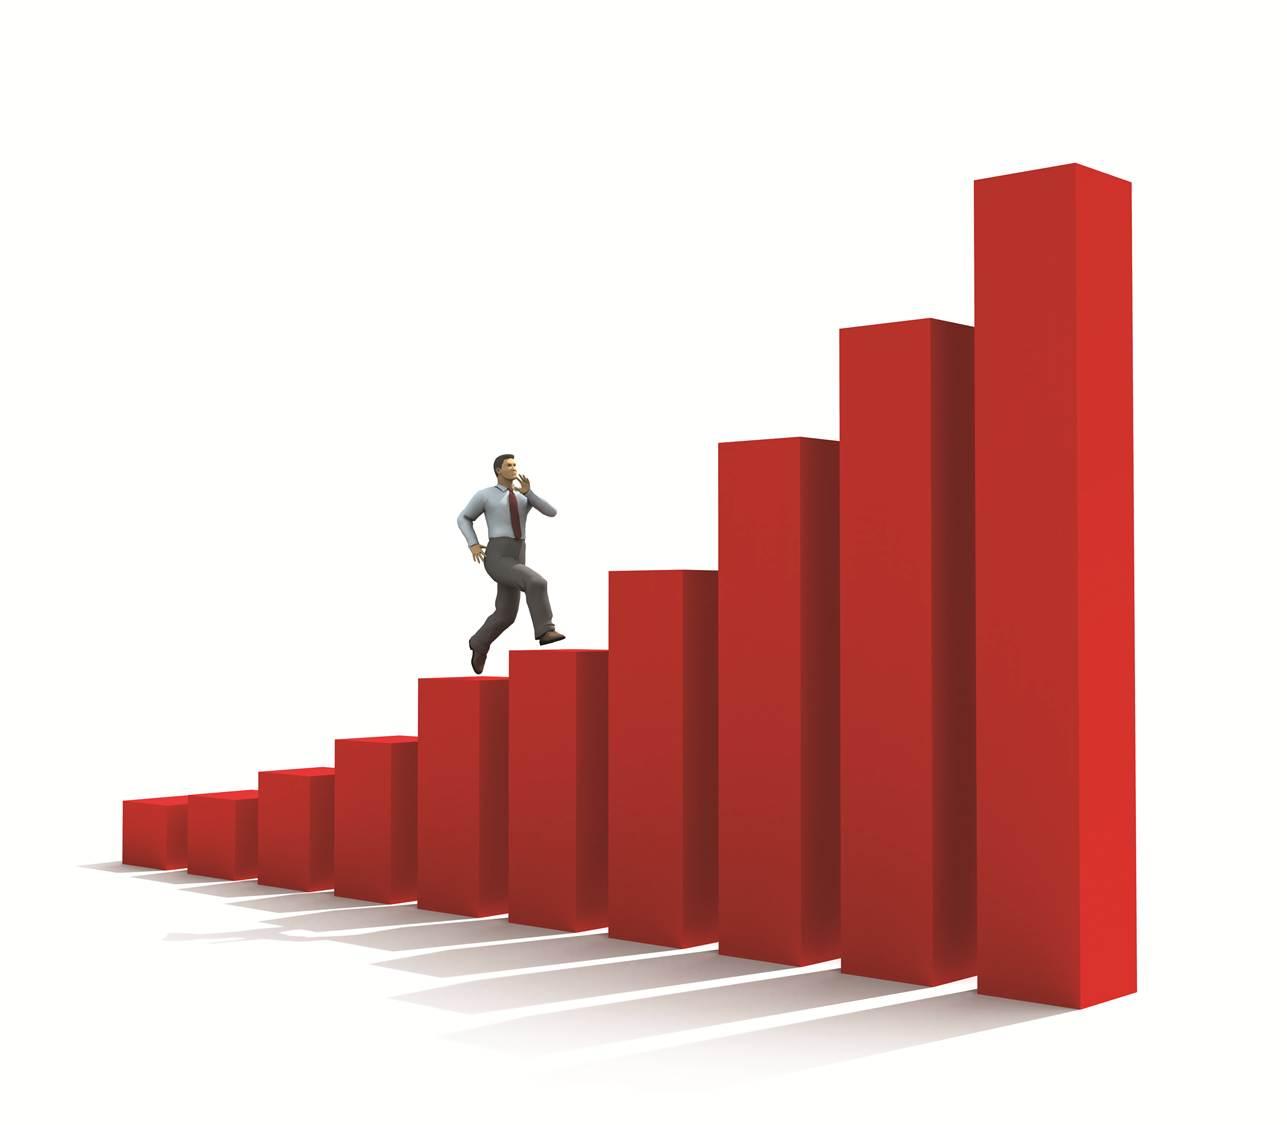 performans de u011ferlendirmenin avantajlar u0131 ve dezavantajlar u0131